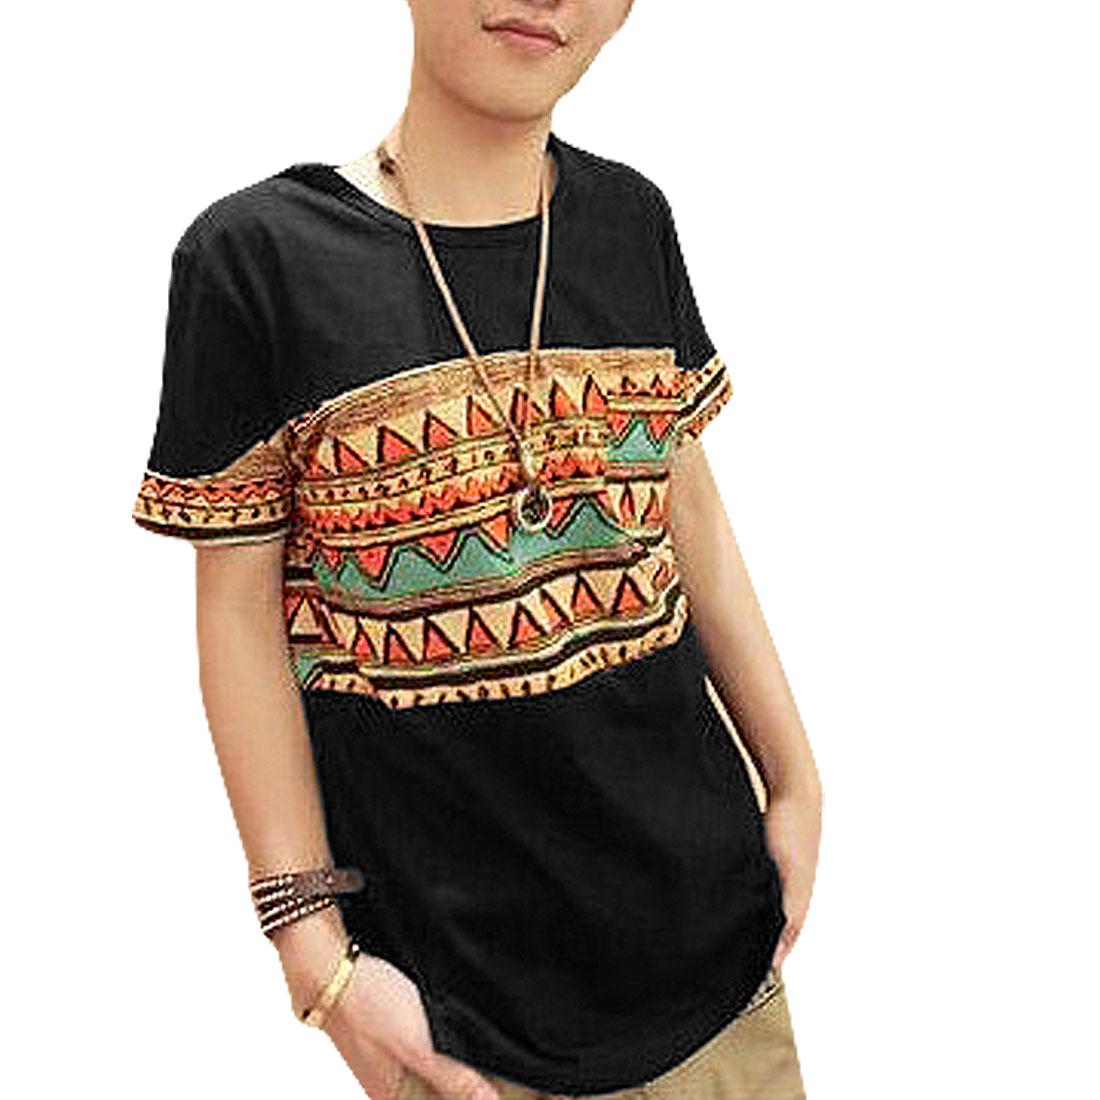 Men Round Neck Summer Leisure Zigzag Print T-Shirt Blouse Top Black M